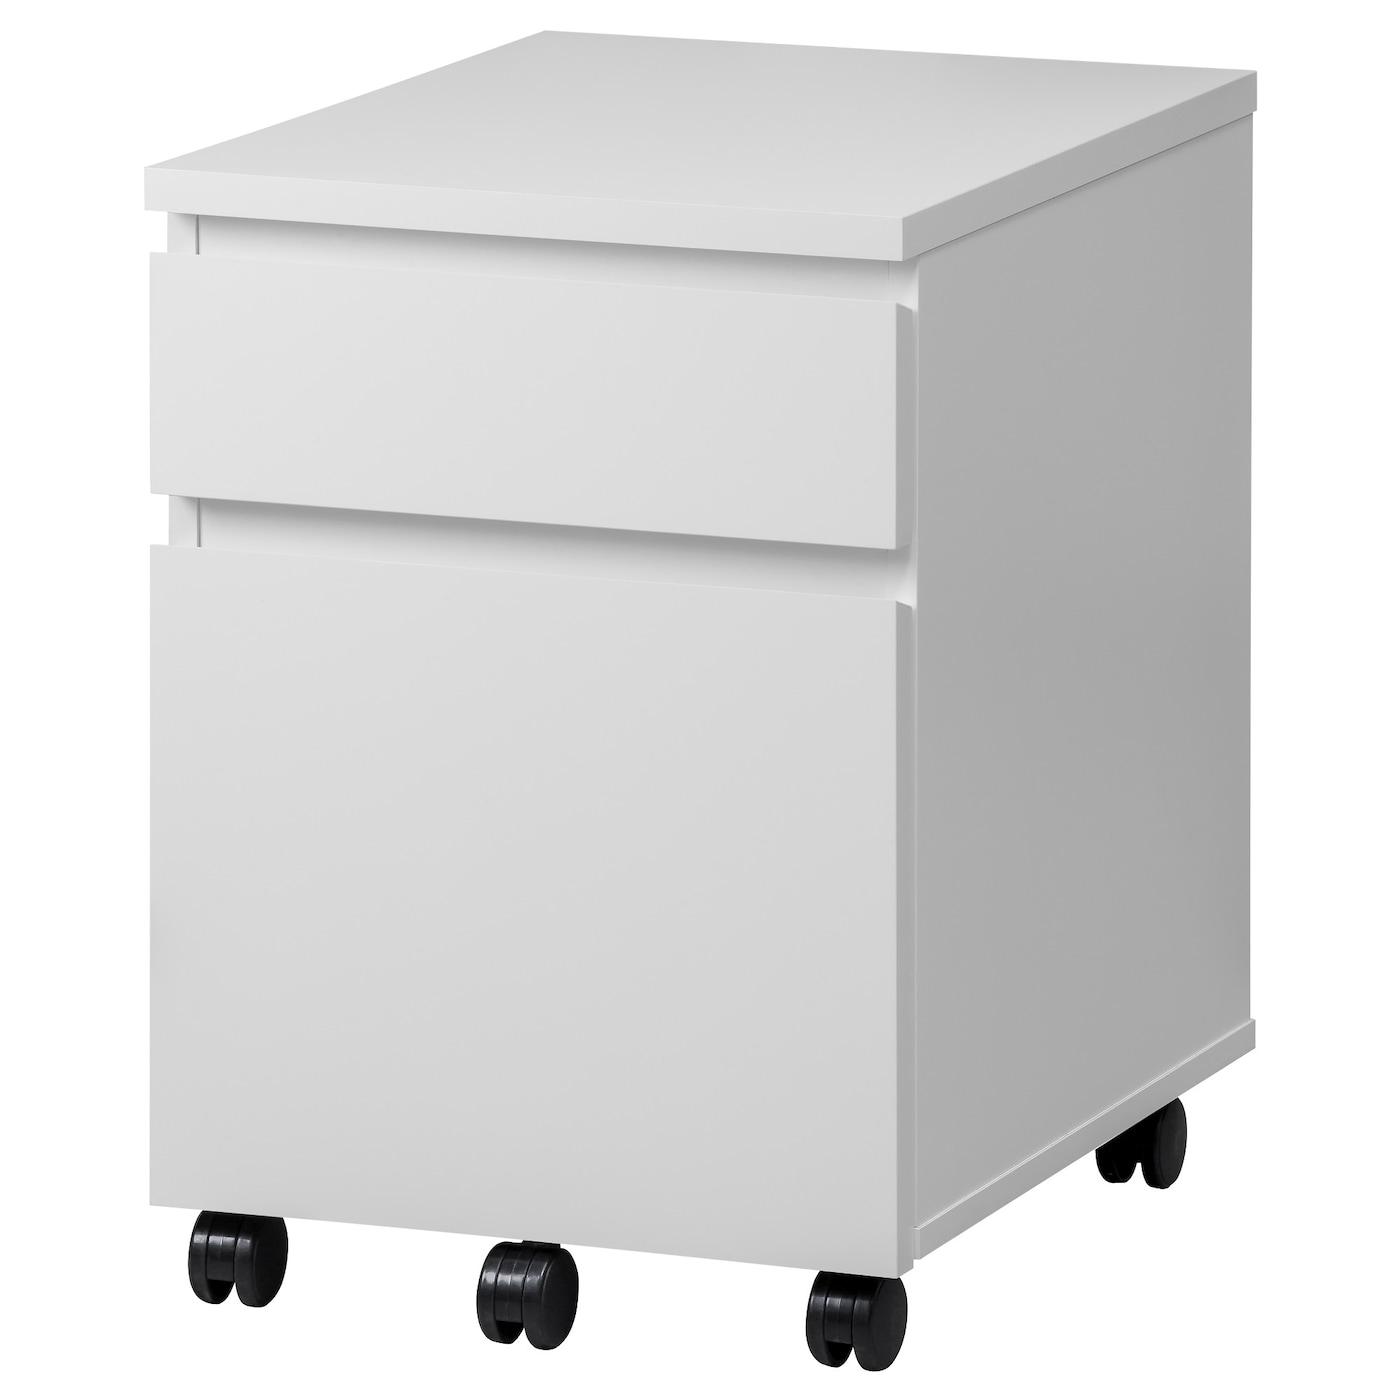 IKEA MALM biała komoda na kółkach, 42x59 cm